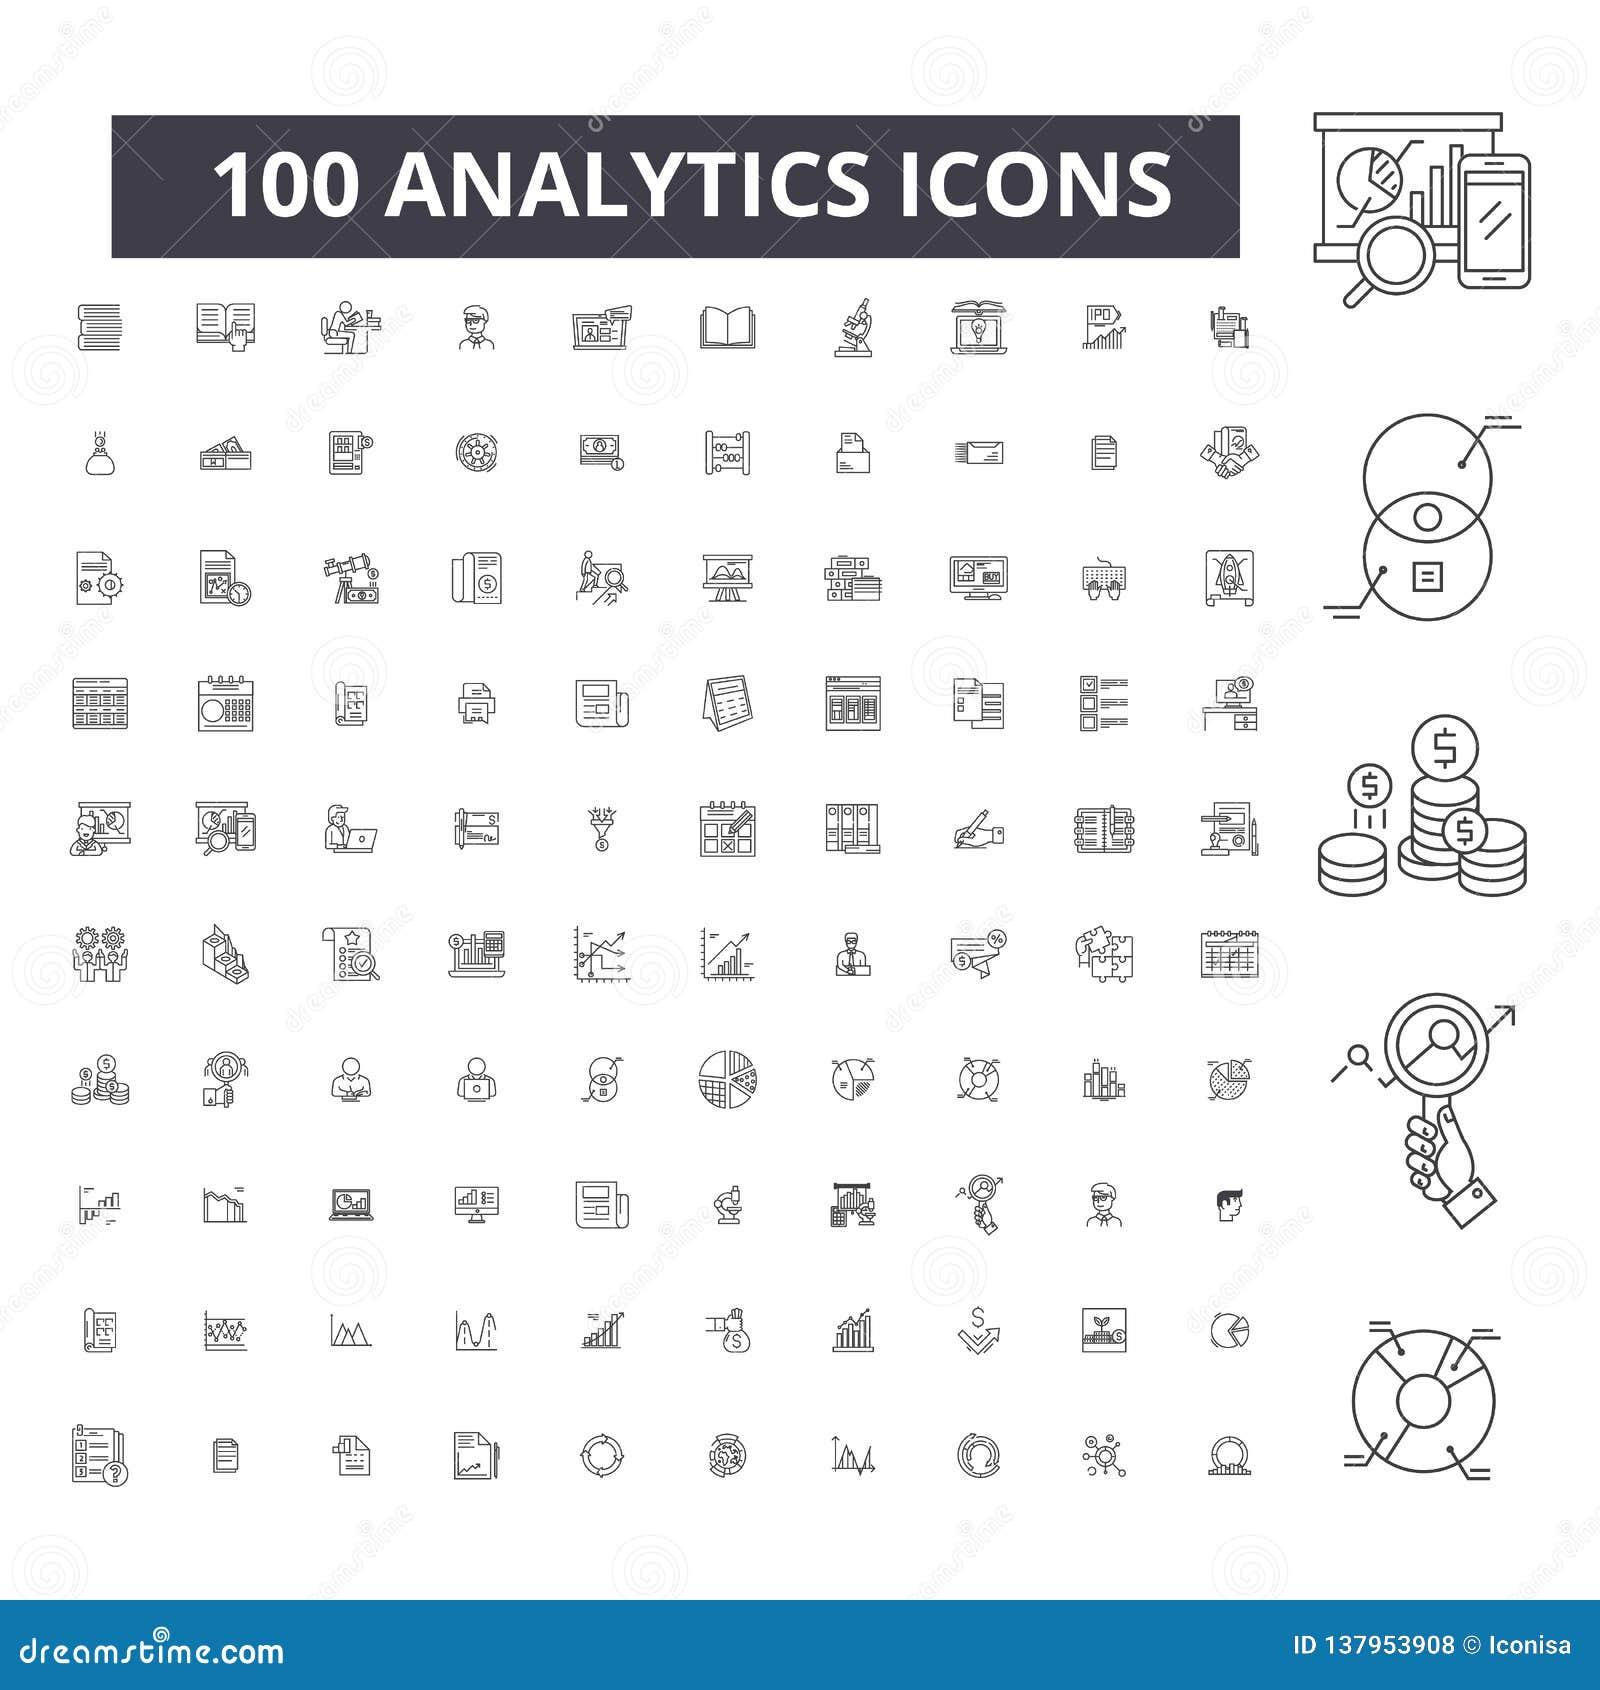 Editable εικονίδια γραμμών Analytics, 100 διανυσματικό σύνολο, συλλογή Μαύρες απεικονίσεις περιλήψεων Analytics, σημάδια, σύμβολα